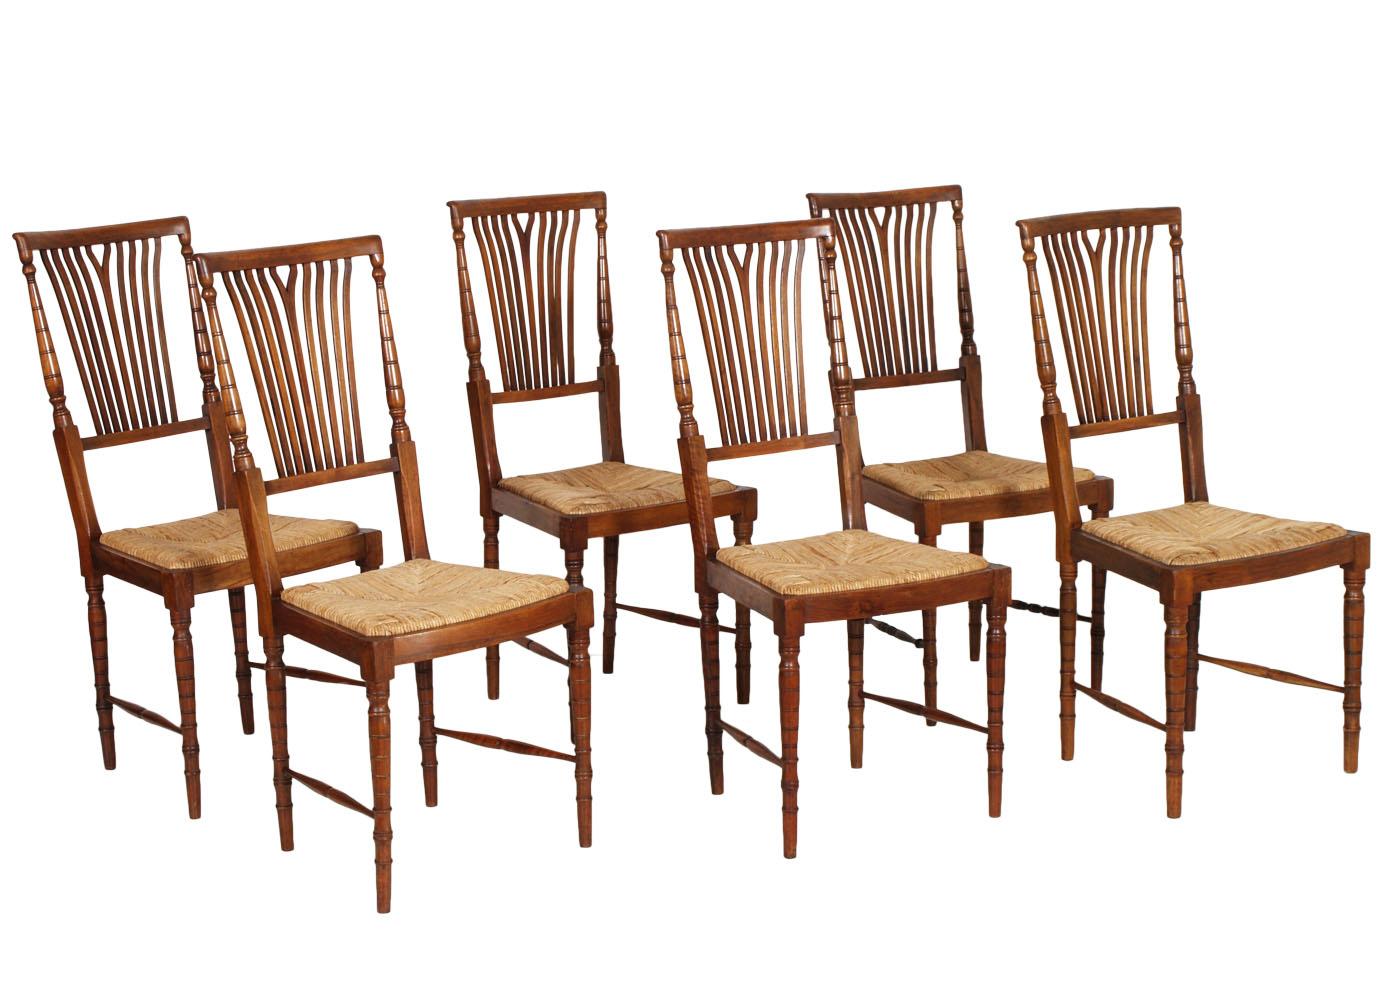 6 sedie set strong chairs chiavari leggere luigi xvi noce